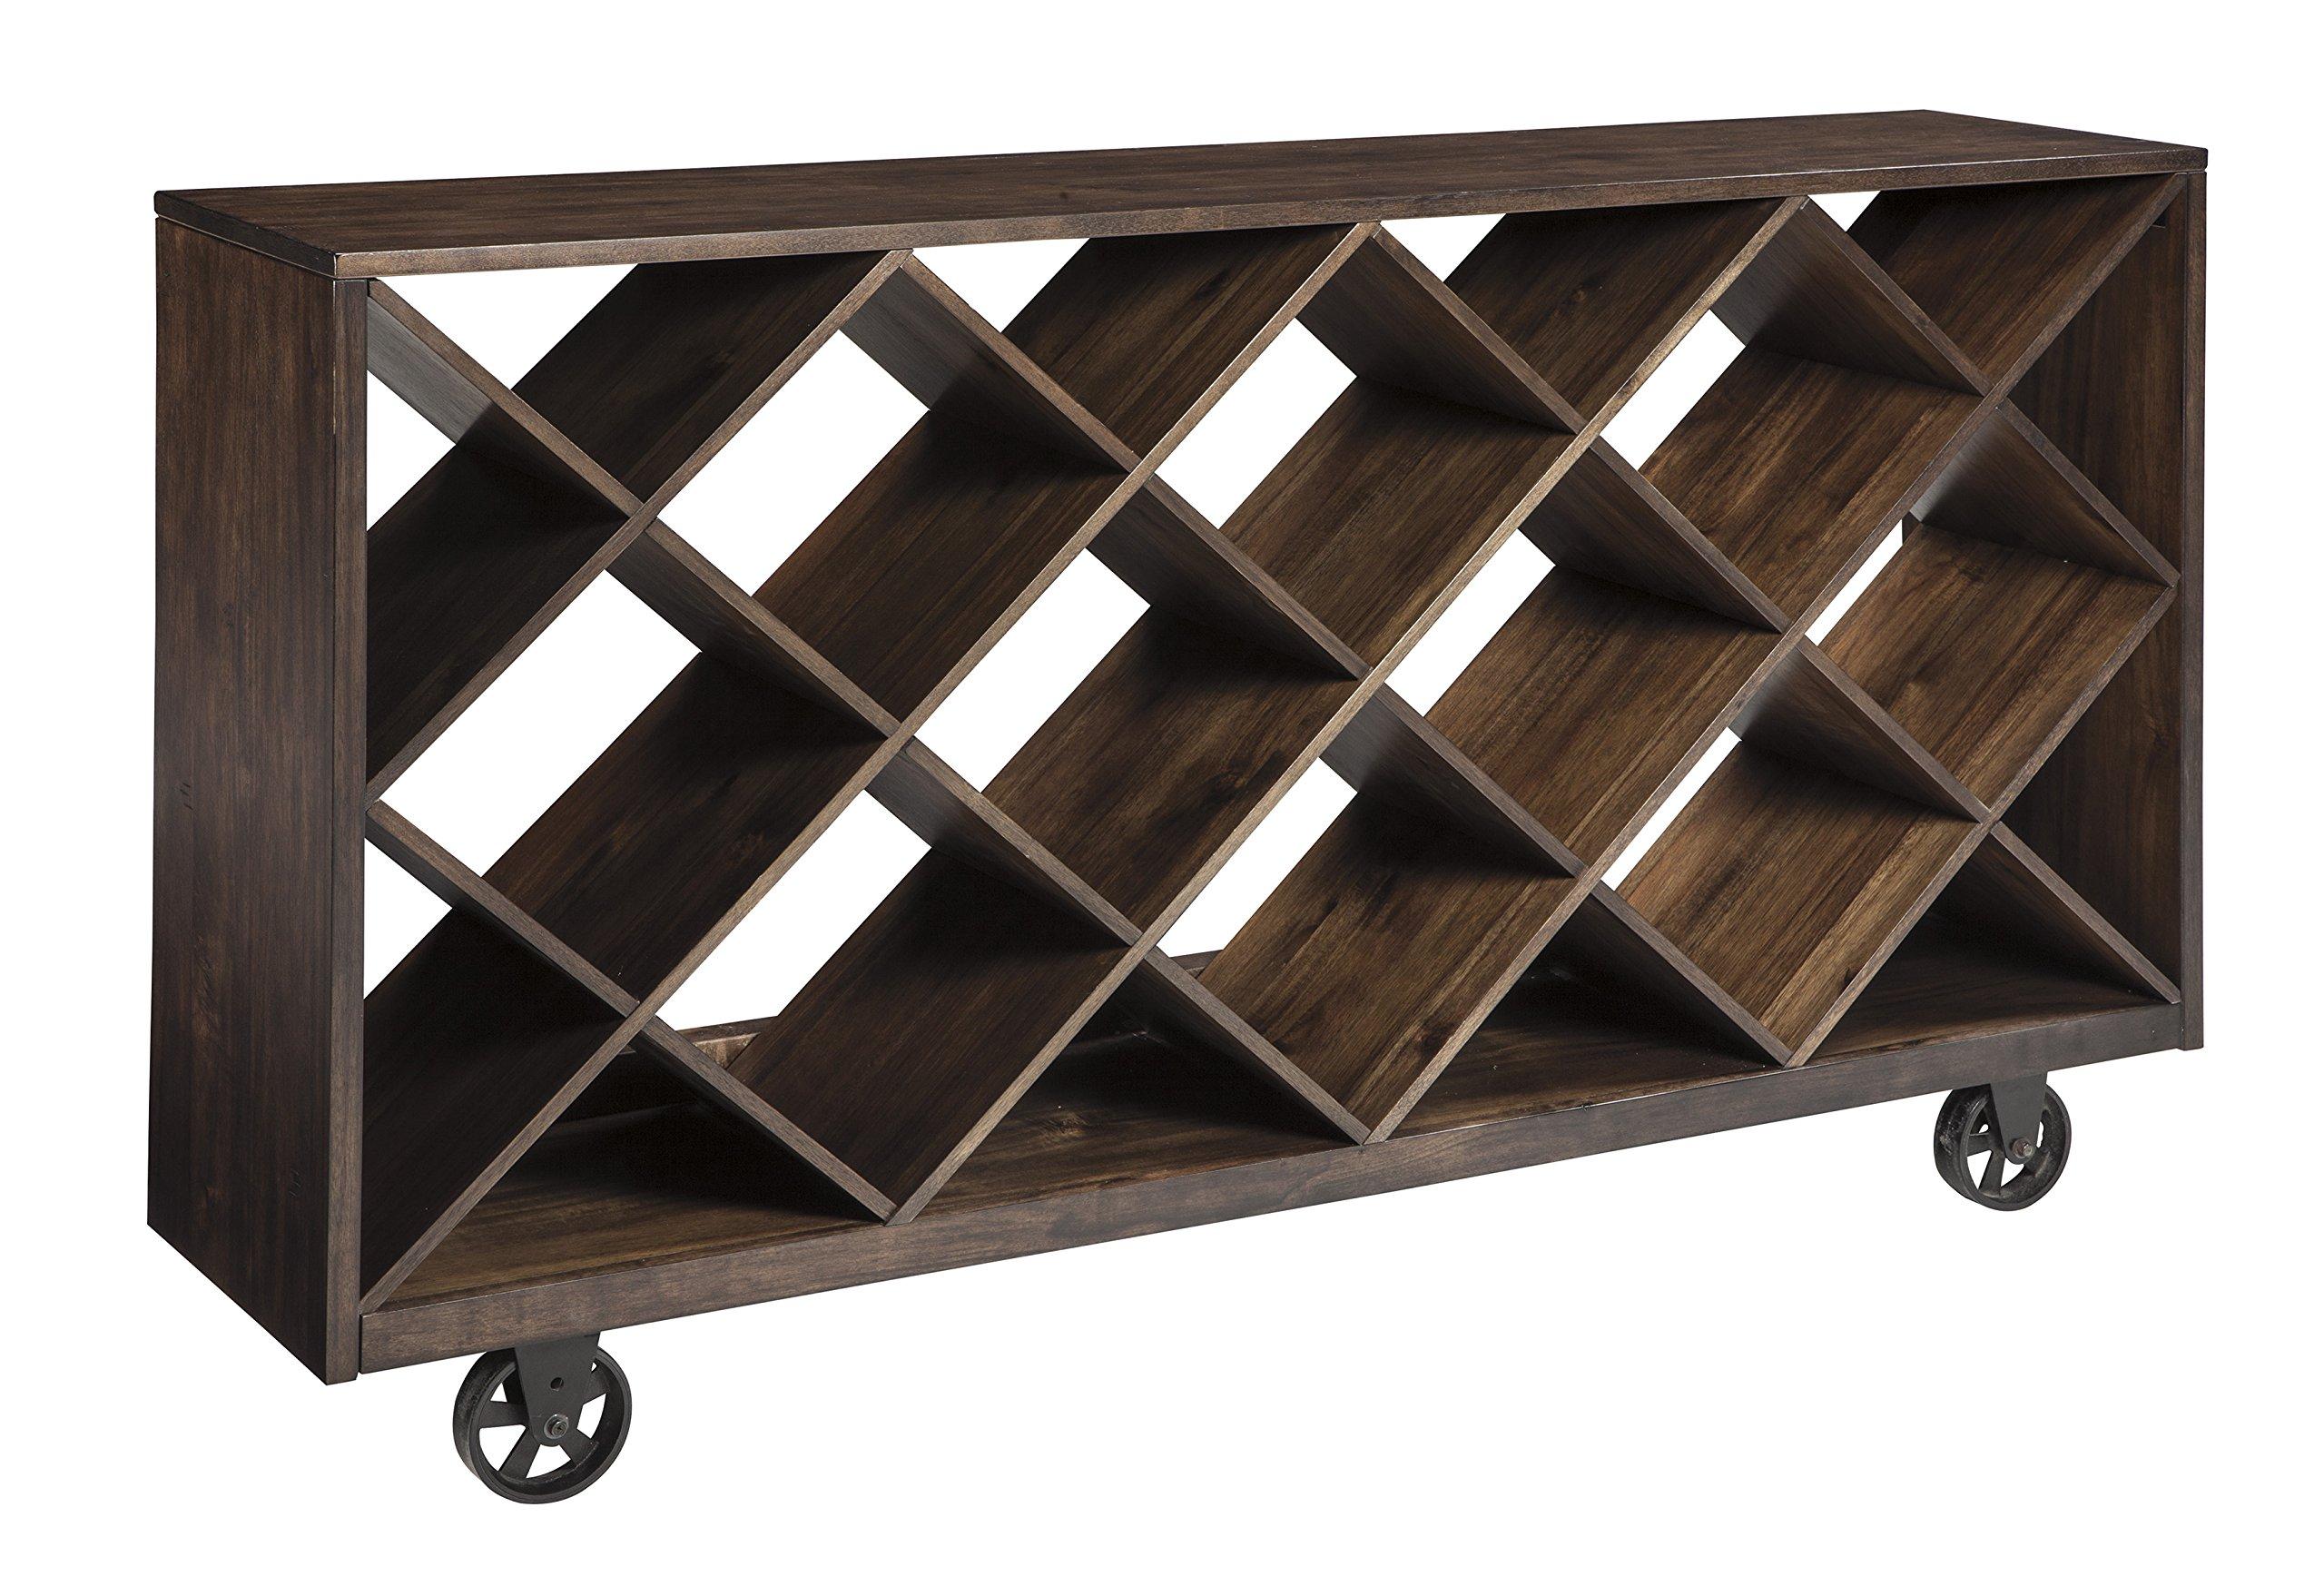 Ashley Furniture Signature Design - Starmore Shelf & Console Table - Rustic Contemporary Bookshelf - Brown